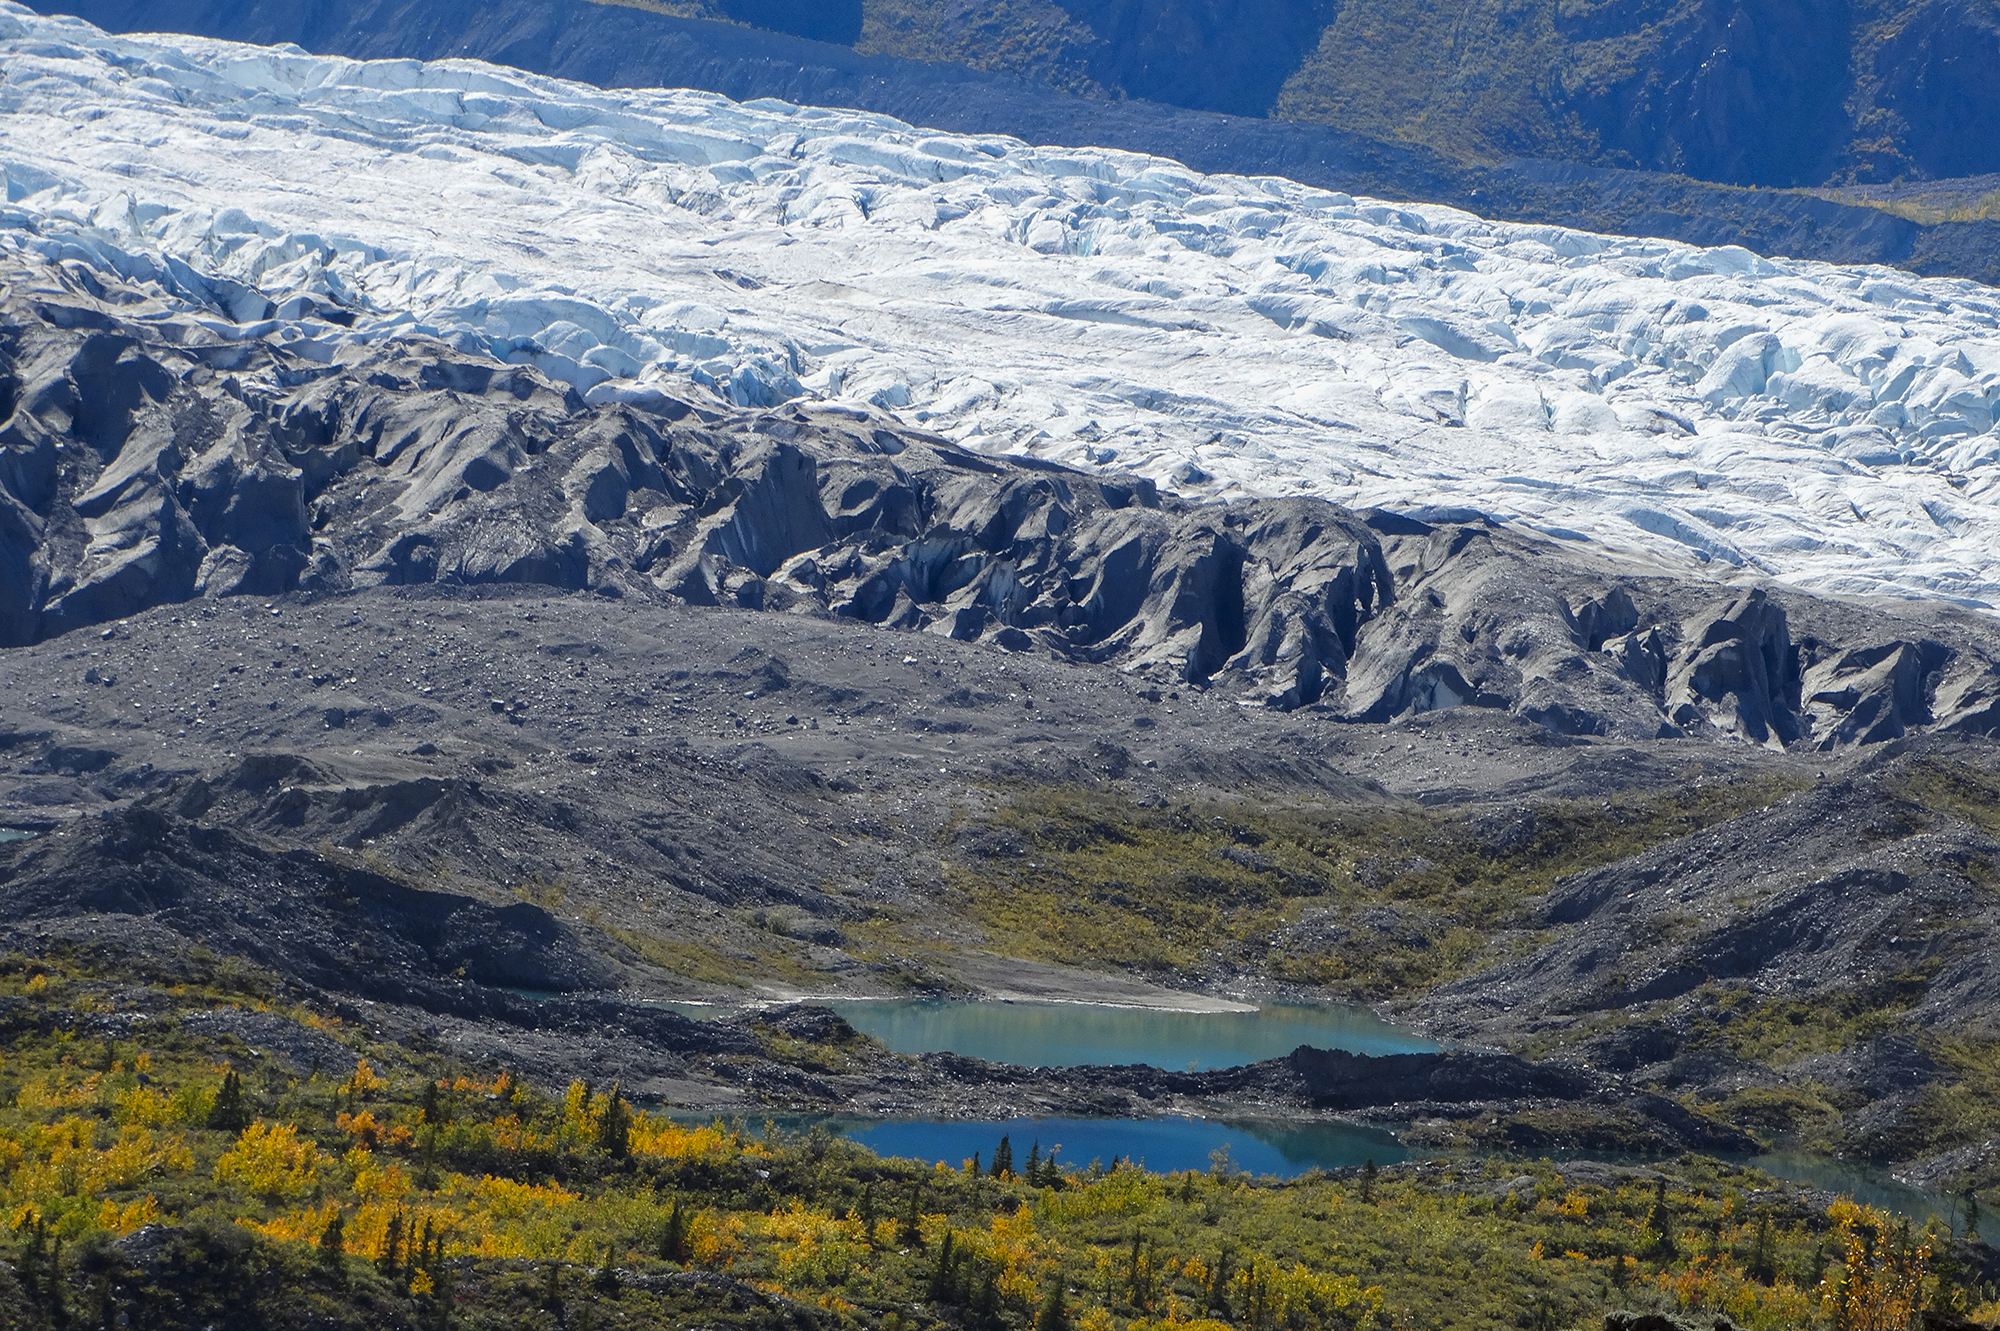 Donjek Glacier, Kluane National Park and Reserve, Yukon Territory, Canada